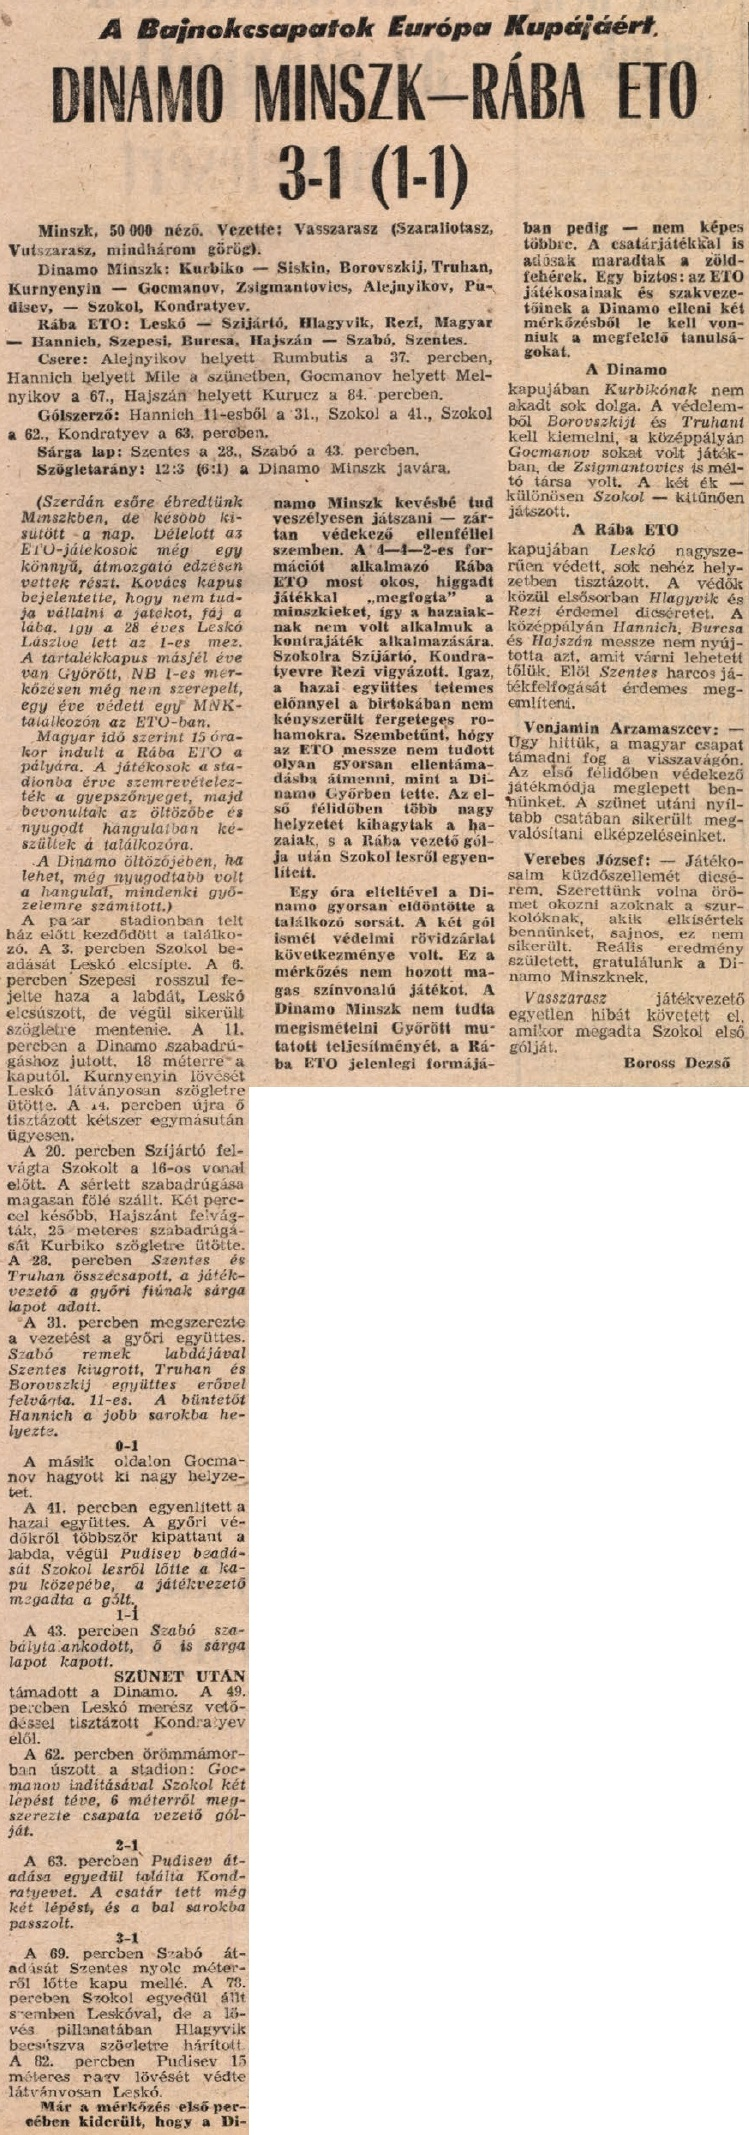 idokapszula_nb_i_1983_84_klubcsapataink_nemzetkozi_kupaszereplese_2_fordulo_2_kor_dinamo_minszk_raba_eto.jpg